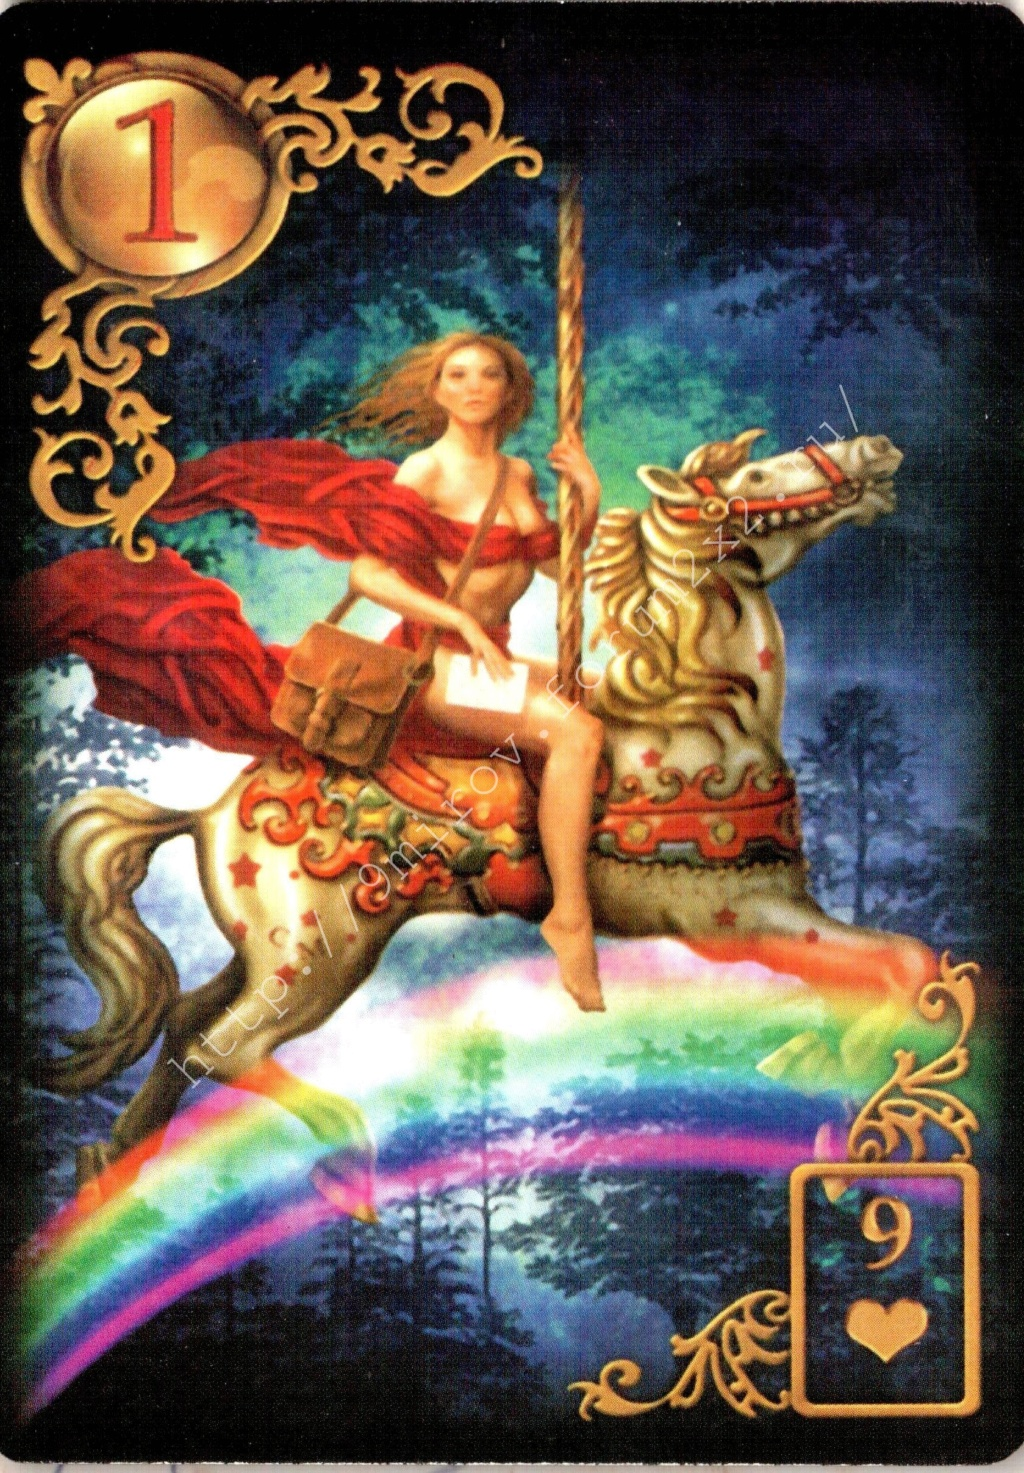 Золотые мечты Ленорман (Расширенное издание) | Gilded Reverie Lenormand. Галерея.  Waterm97